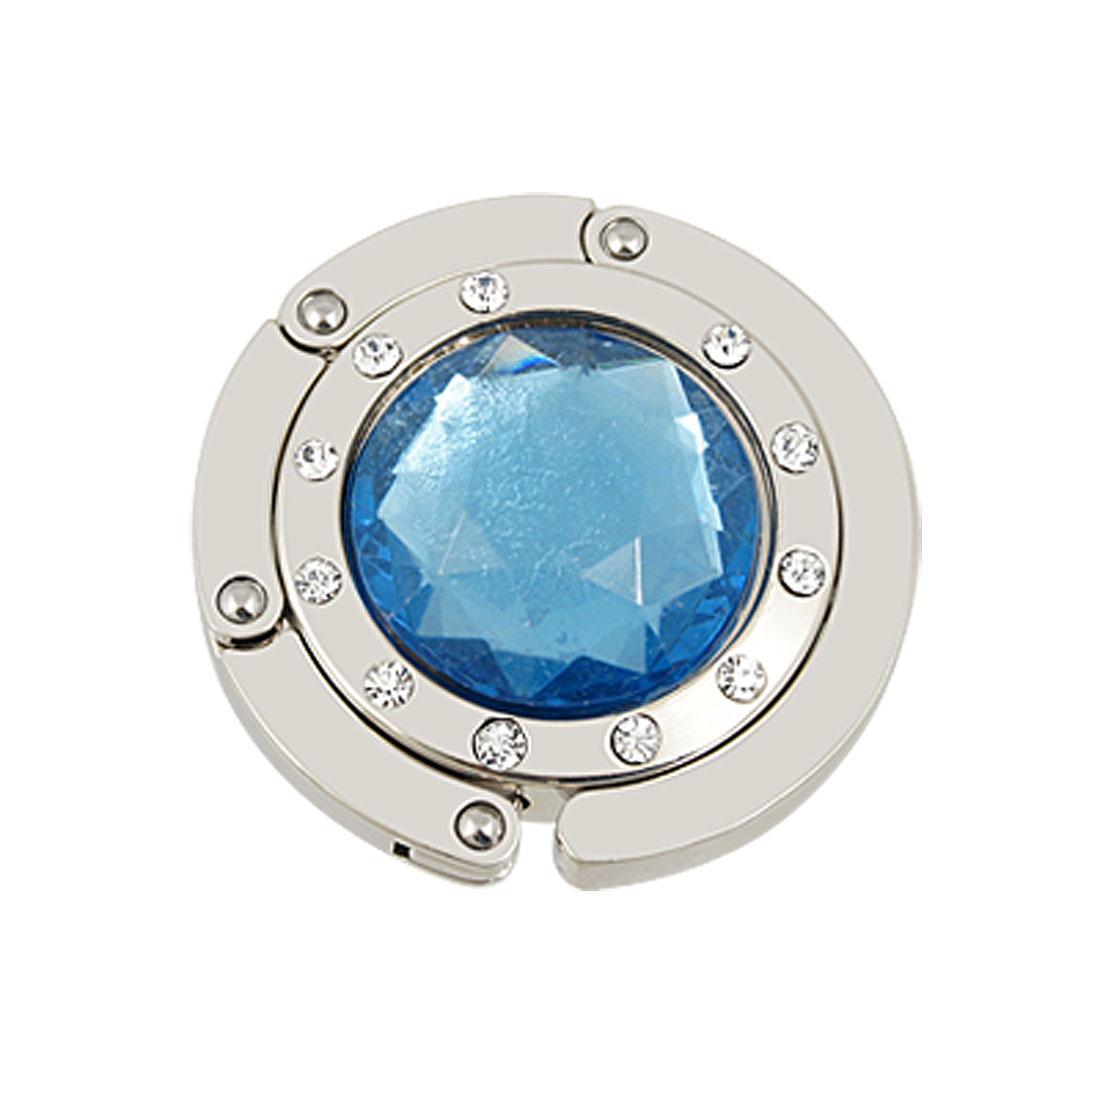 Blue Argyle Crystal Decor Folding Round Hanger Handbag Hook